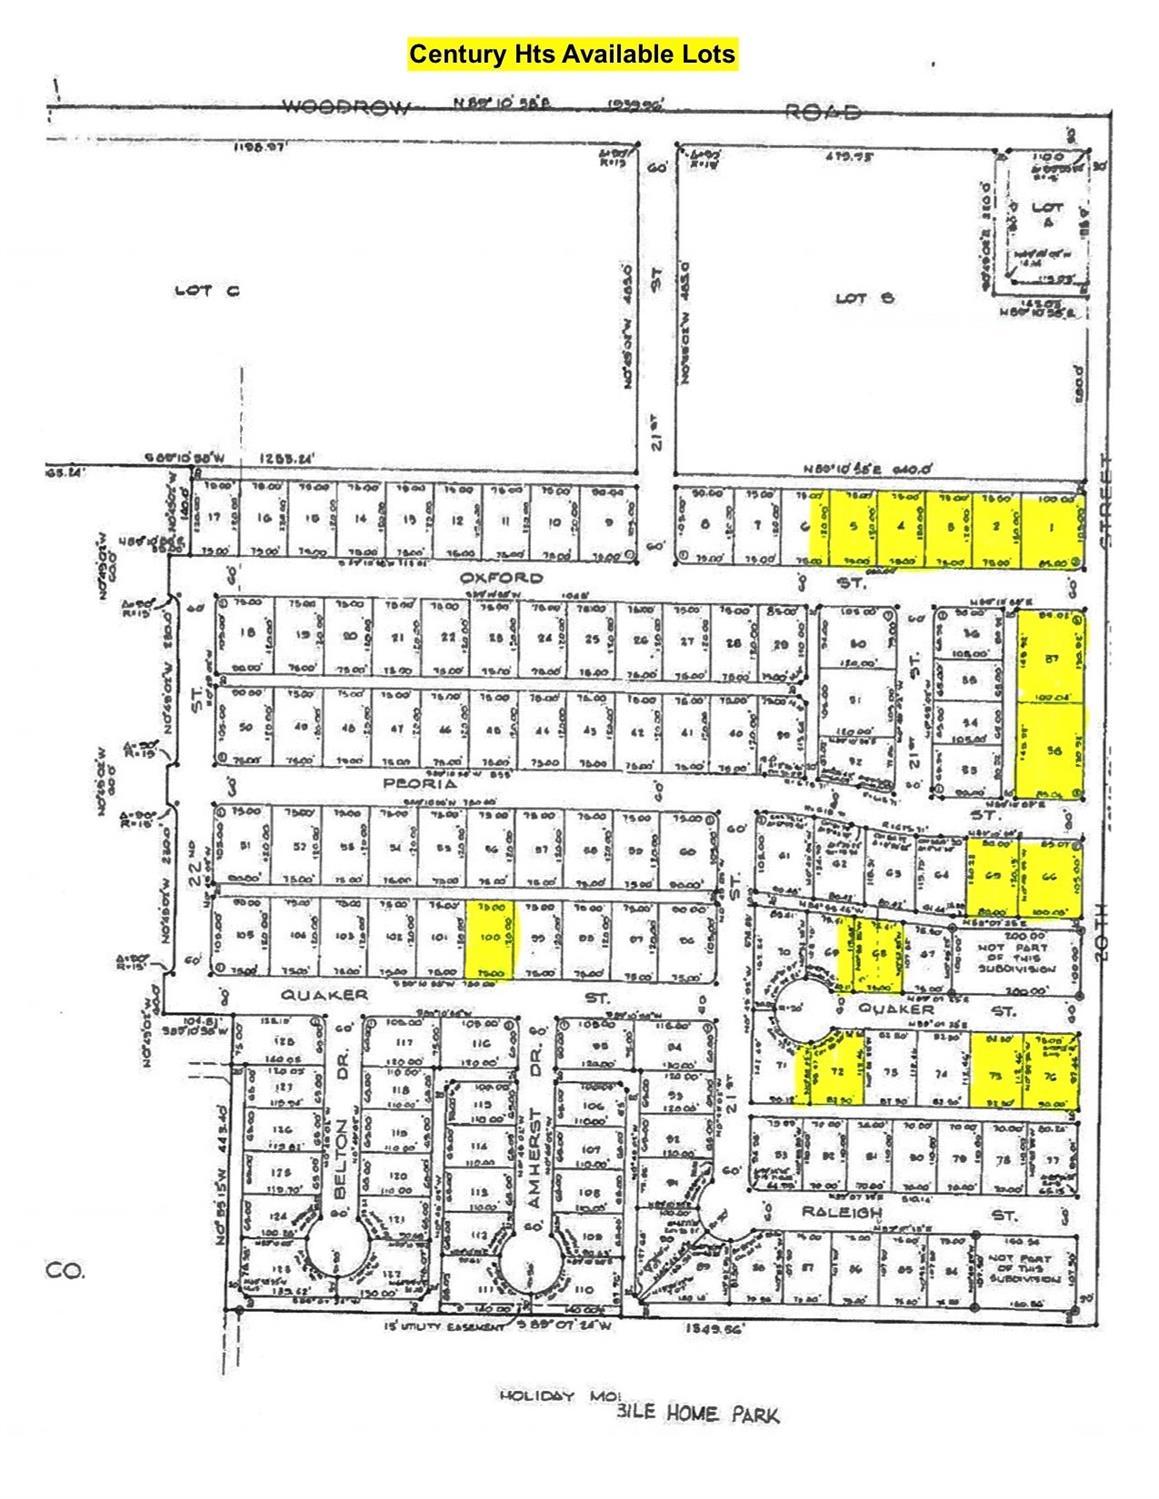 1301 Peoria Street Slaton, TX 79364